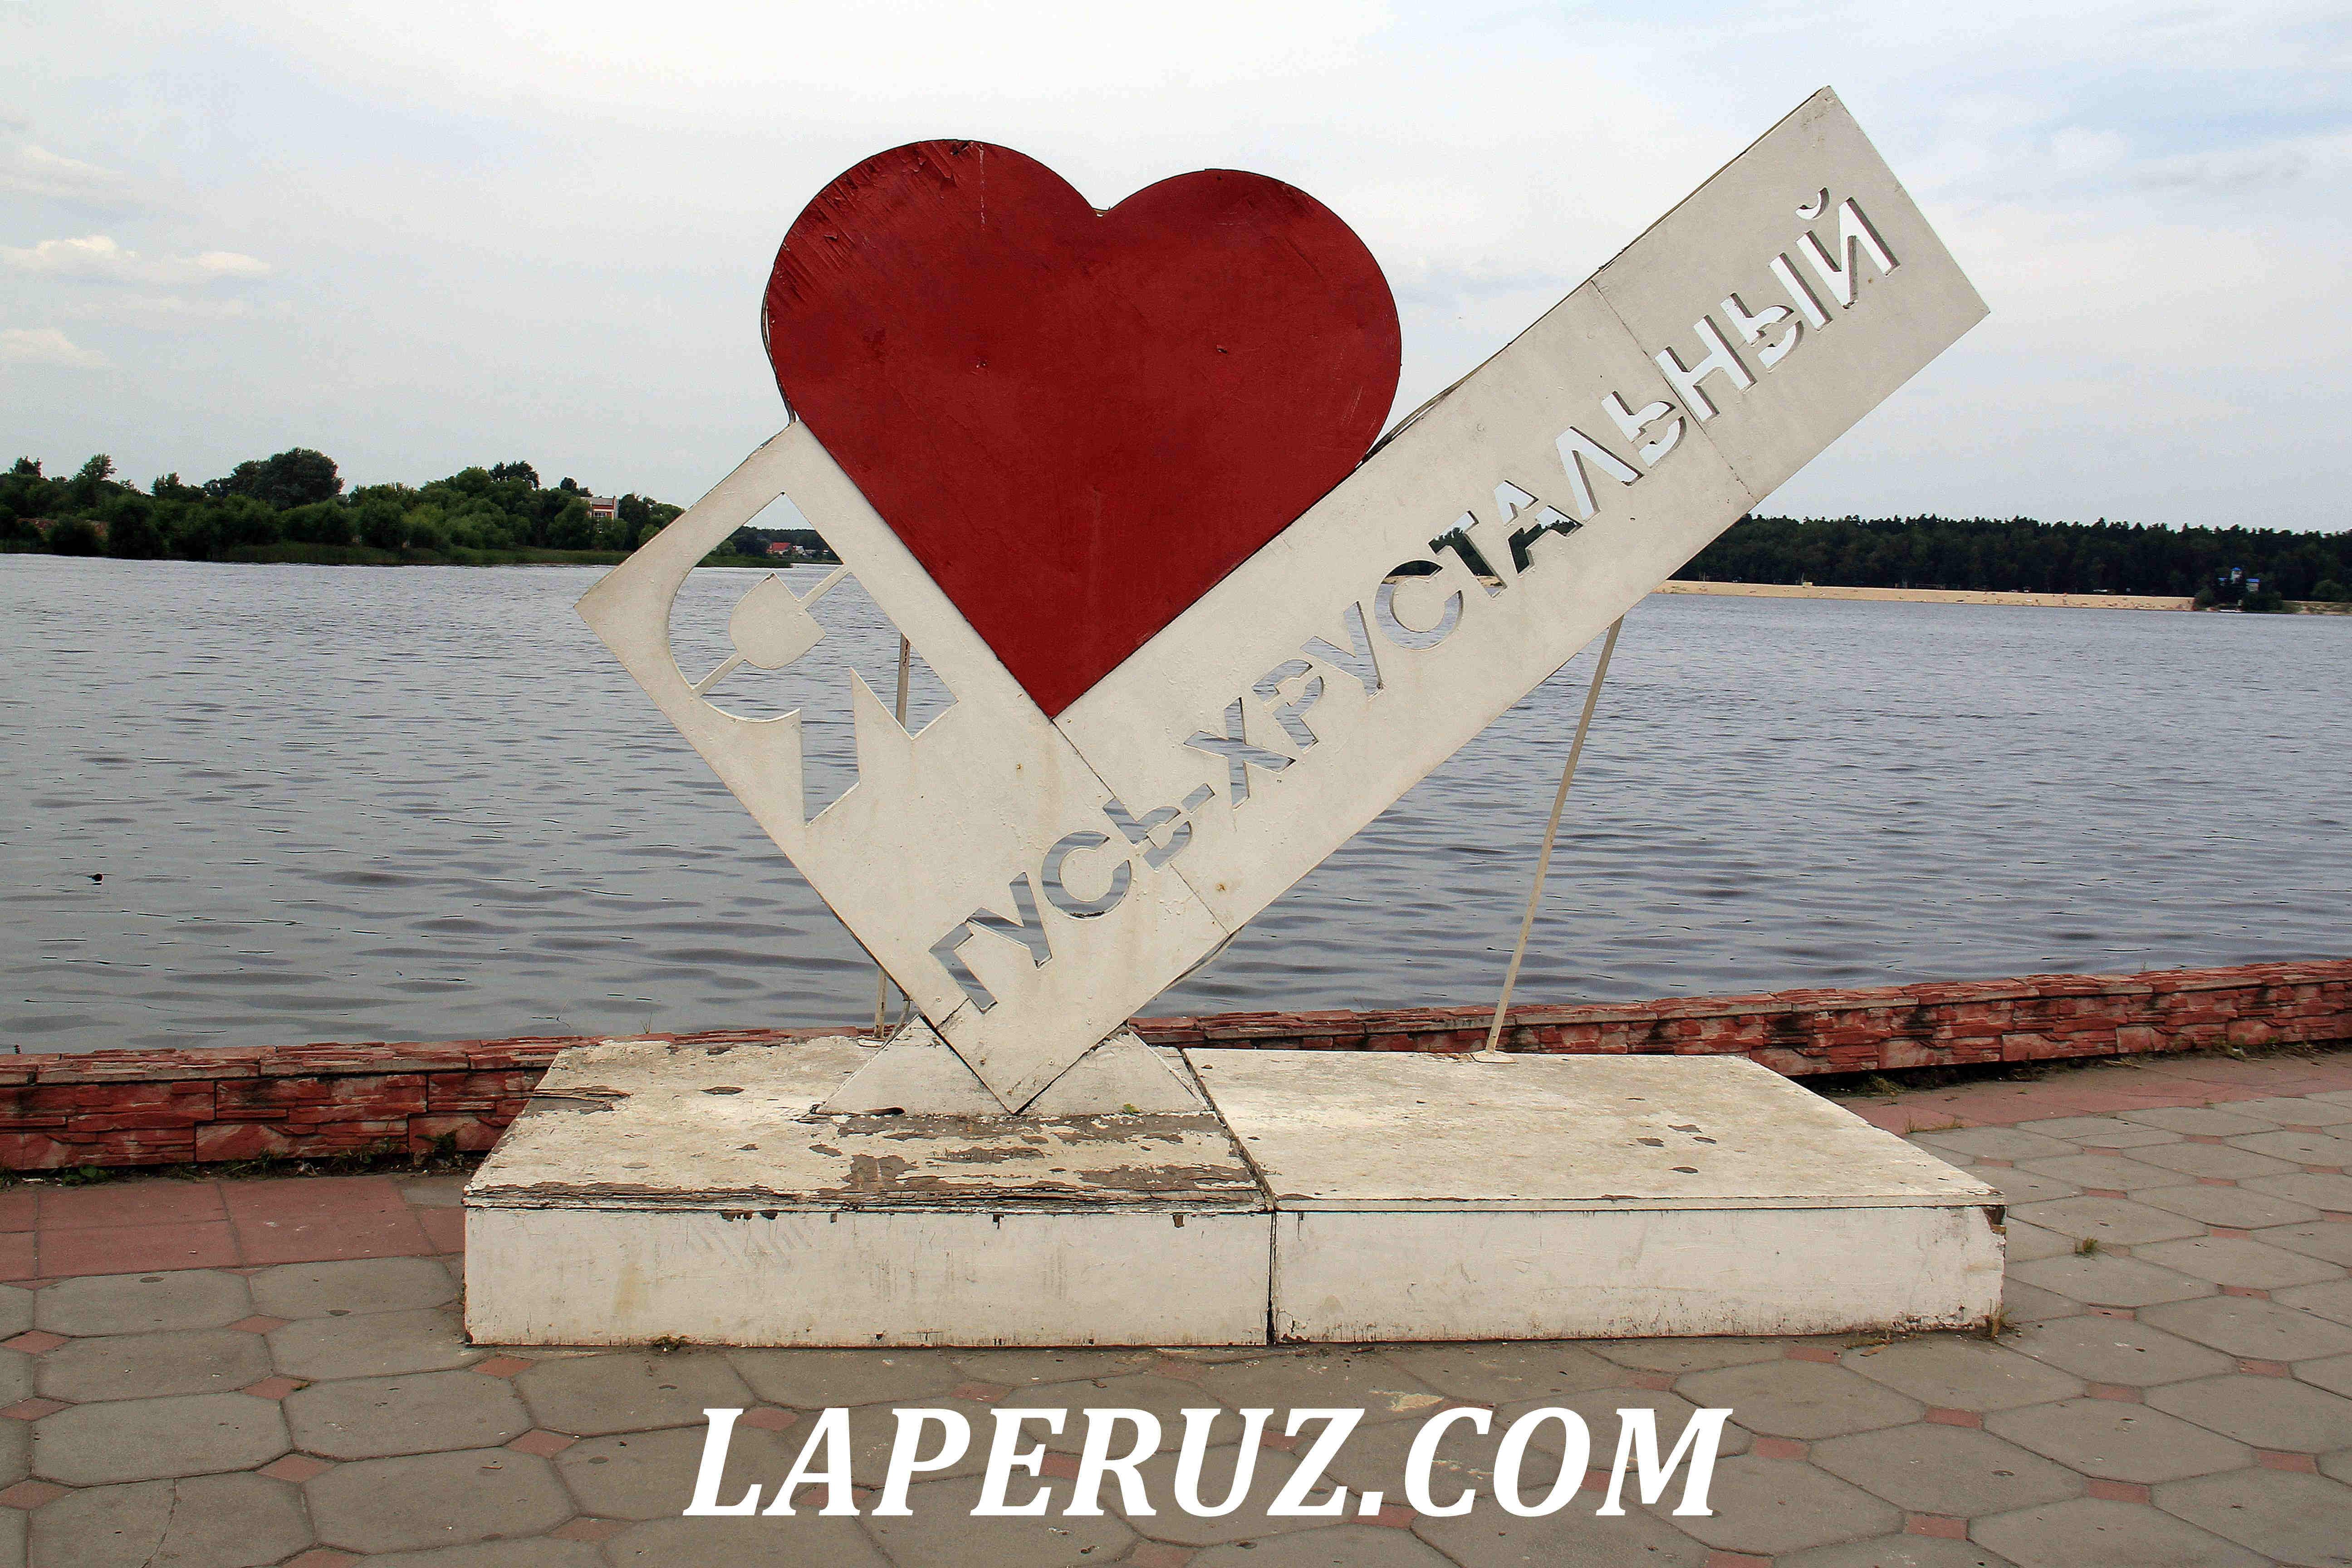 gus_hrustalnyi_1